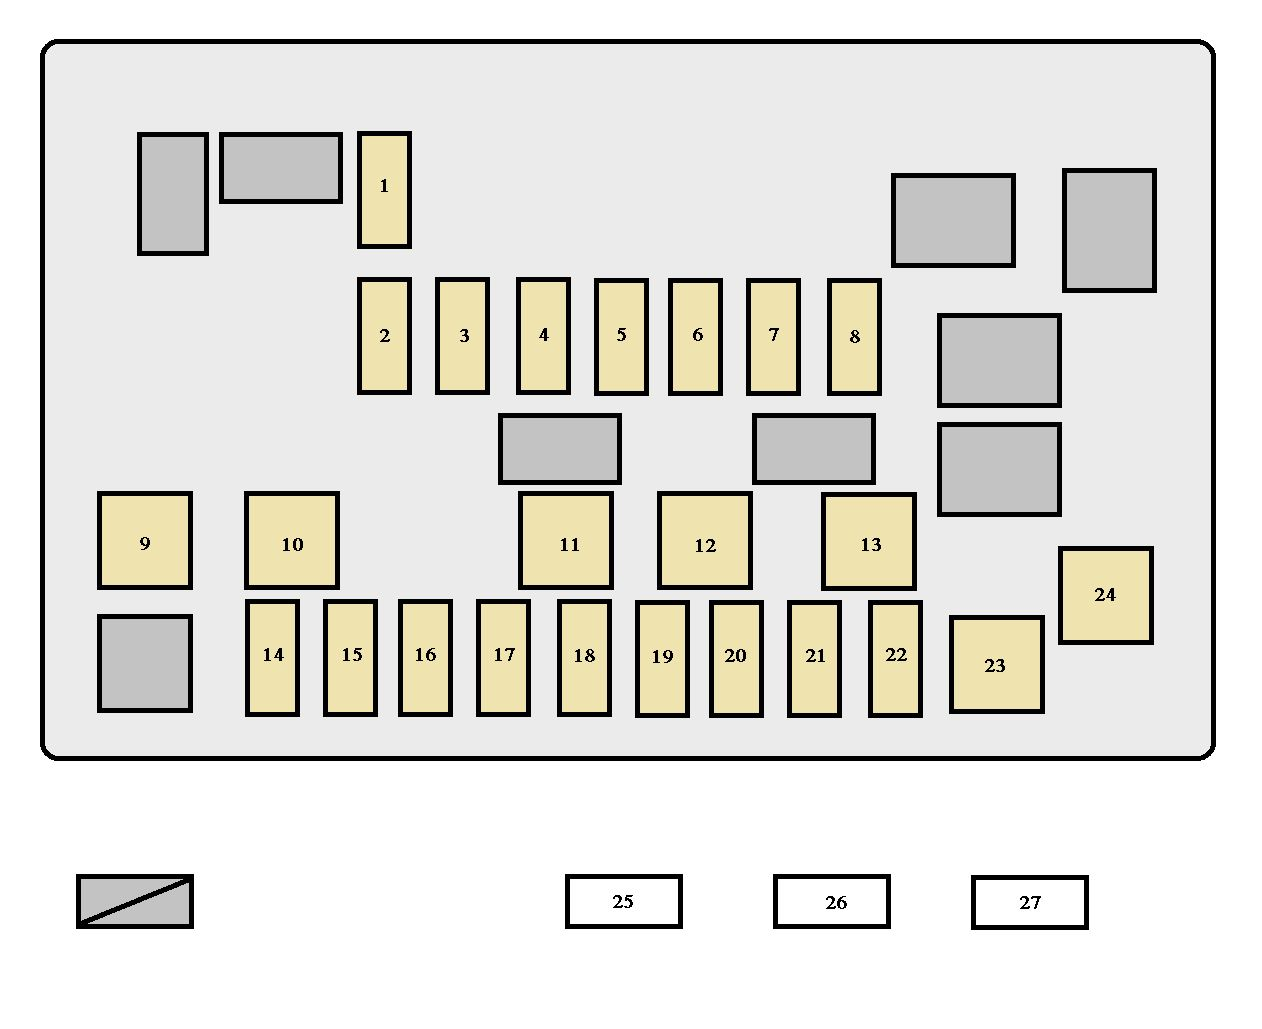 2006 Trailblazer Wiring Diagram Engine